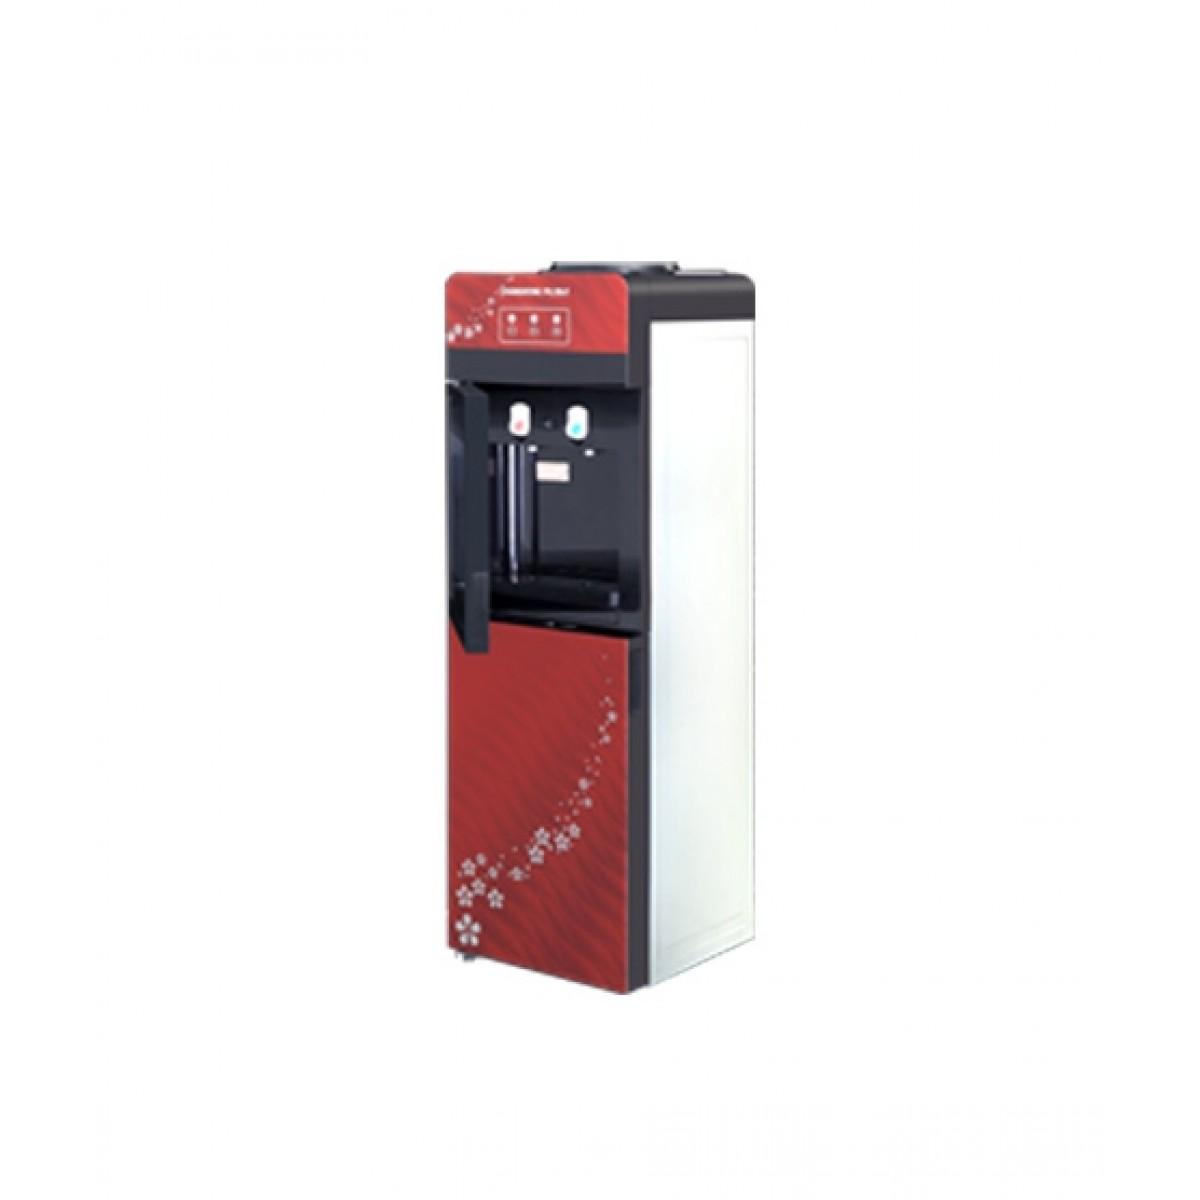 Changhong Ruba Water Dispenser with Refrigerator (WD-CR55G)